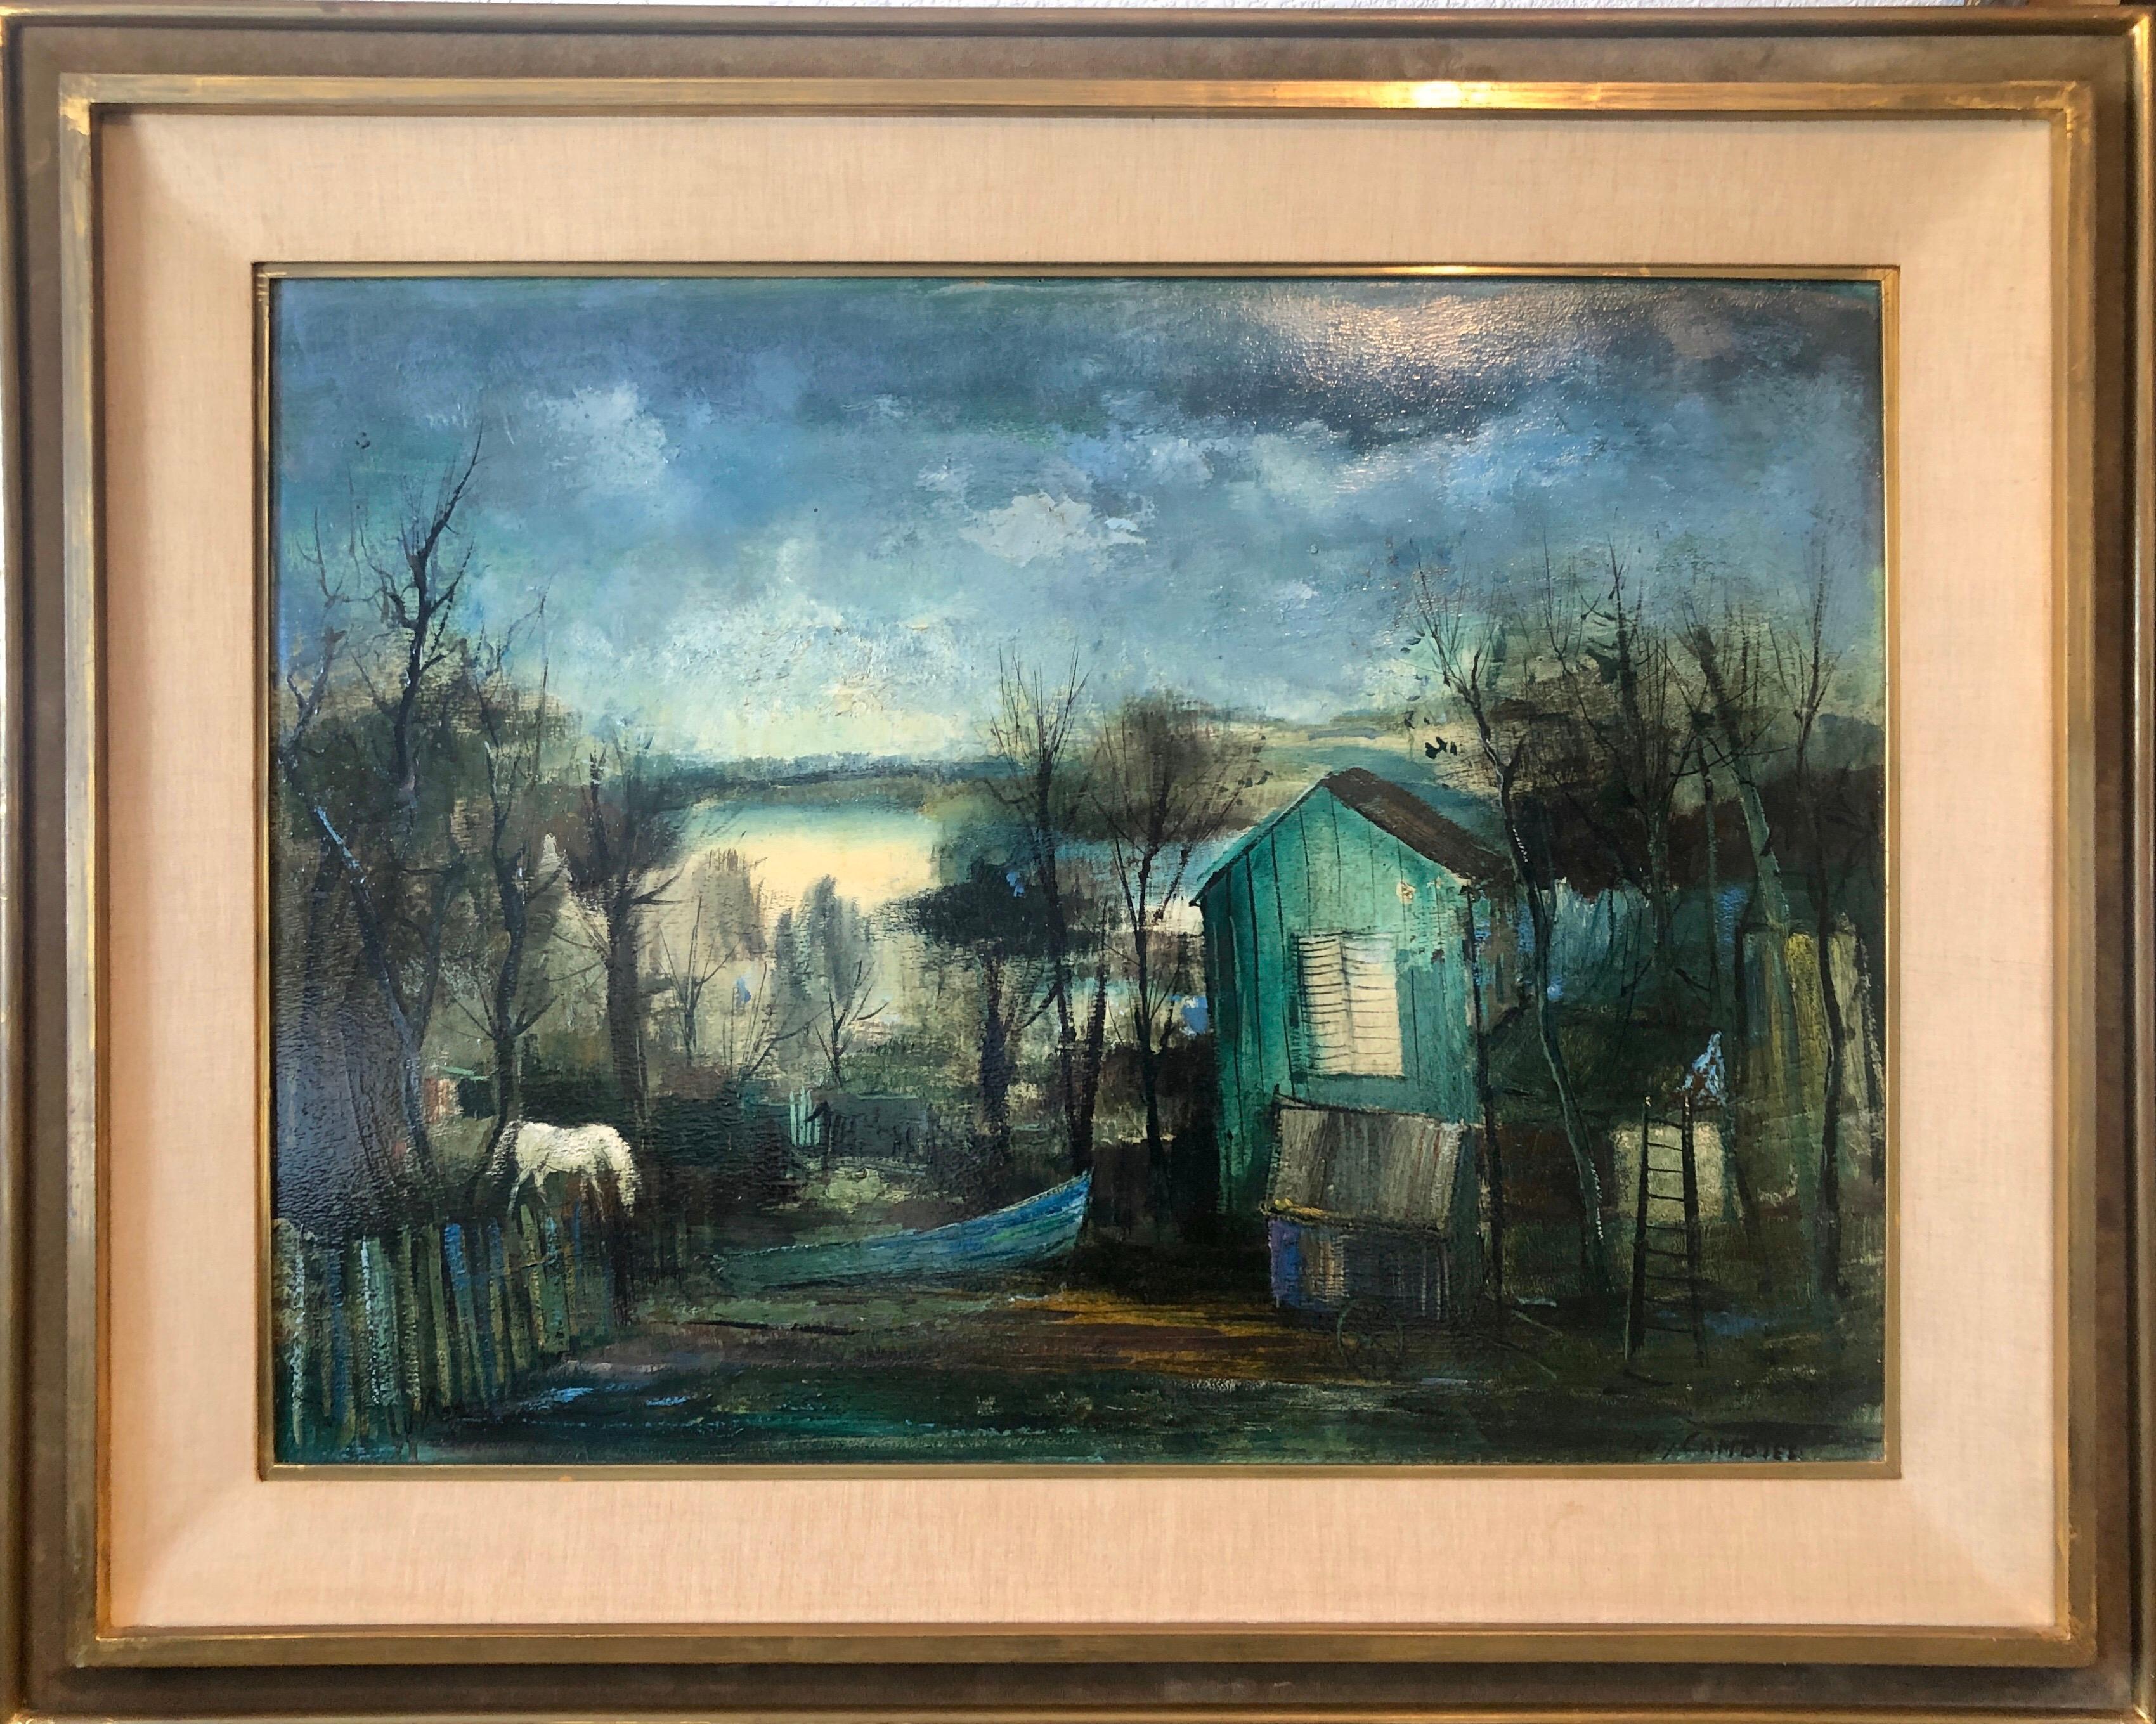 Fishing Shack, School of Paris Barbizon Oil Painting Night Time Landscape, Horse